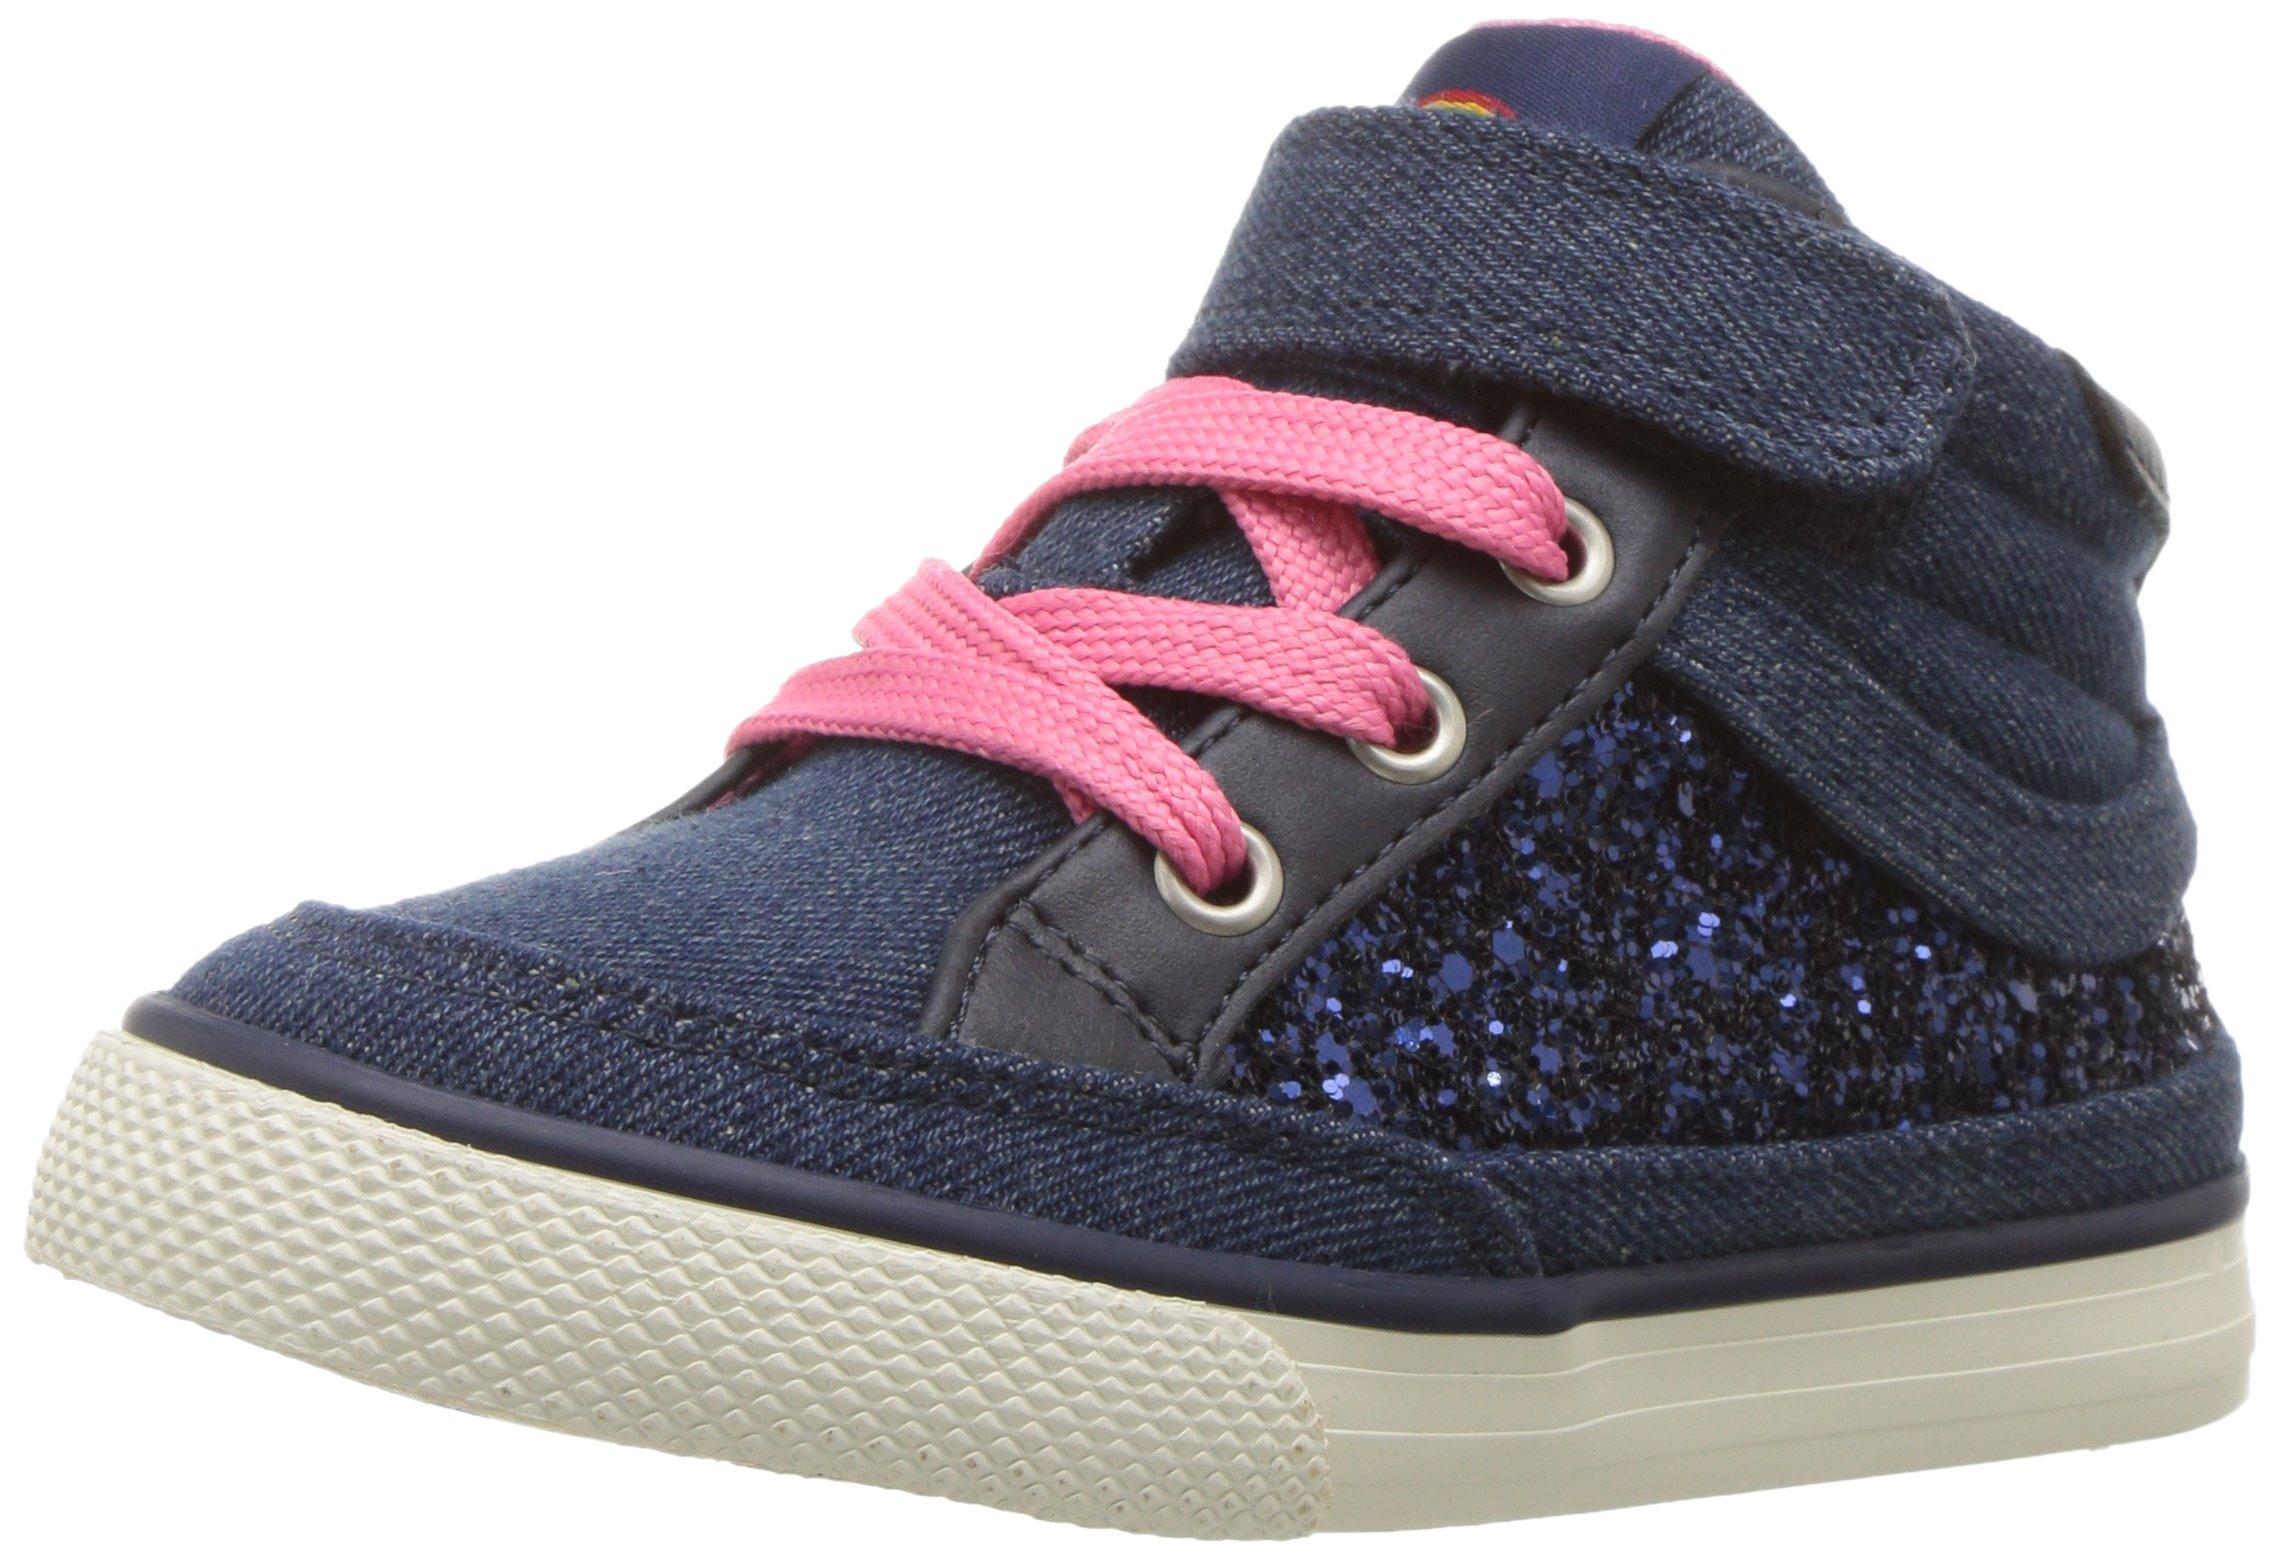 Hanna Andersson Girls' Teo Glitter High Top Sneaker, Navy, 3 M US Little Kid